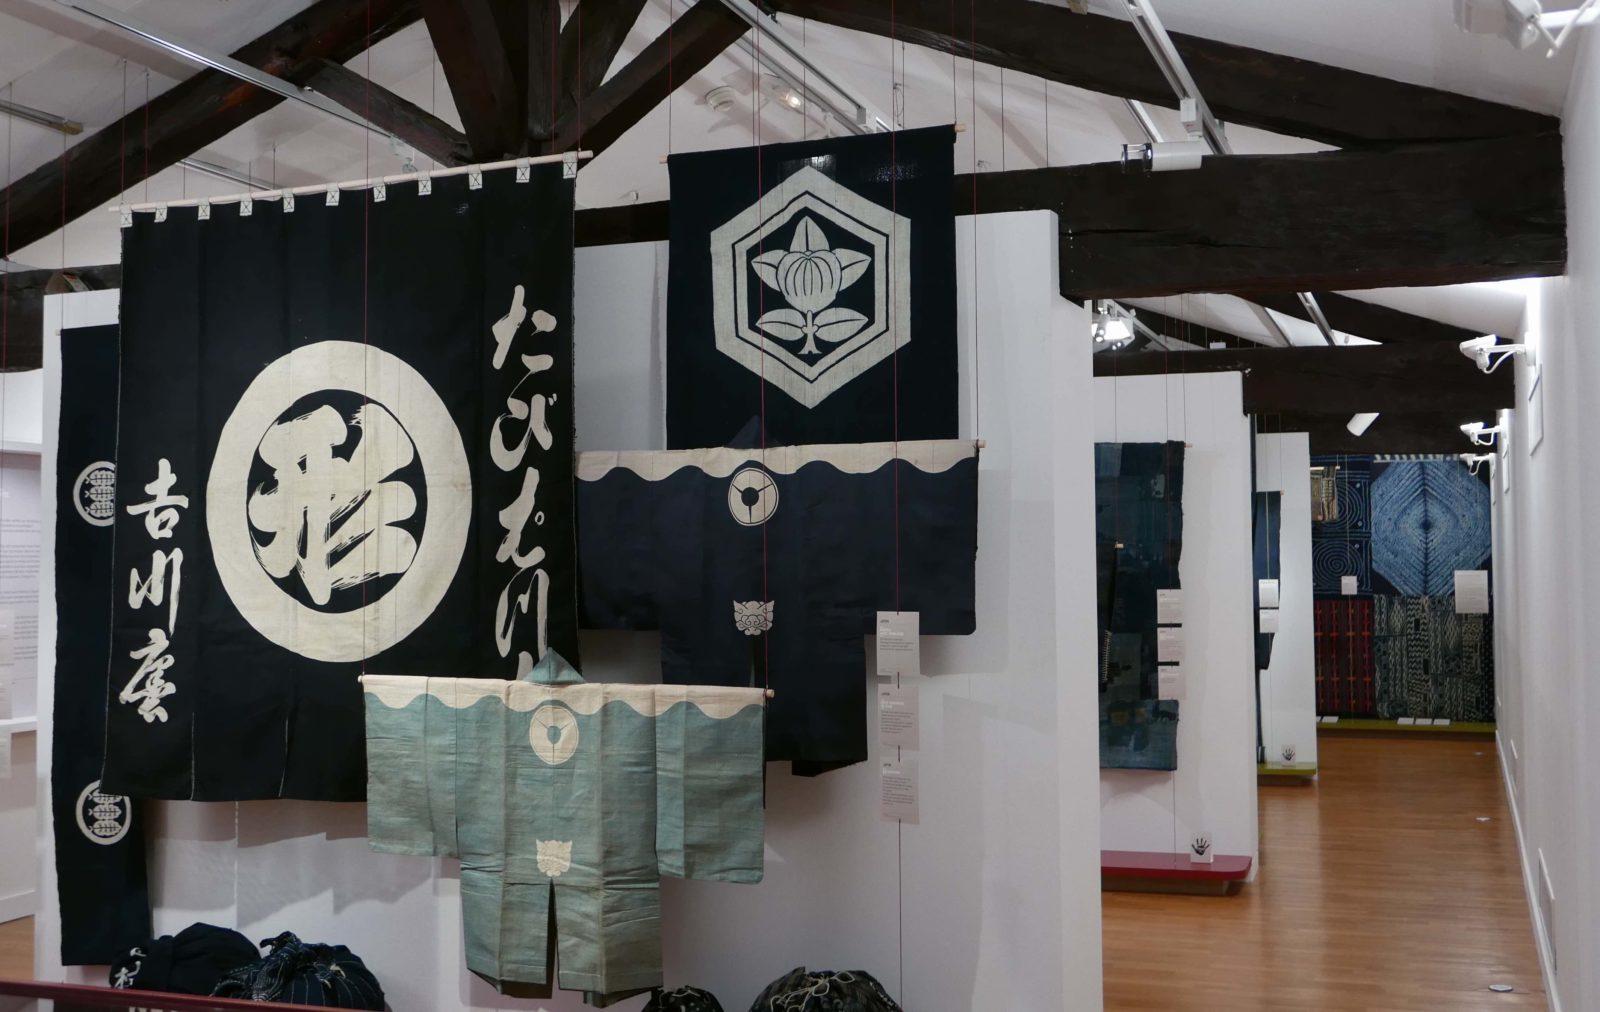 Musée de Bourgoin-Jallieu<br>kimonos exposition Indigo